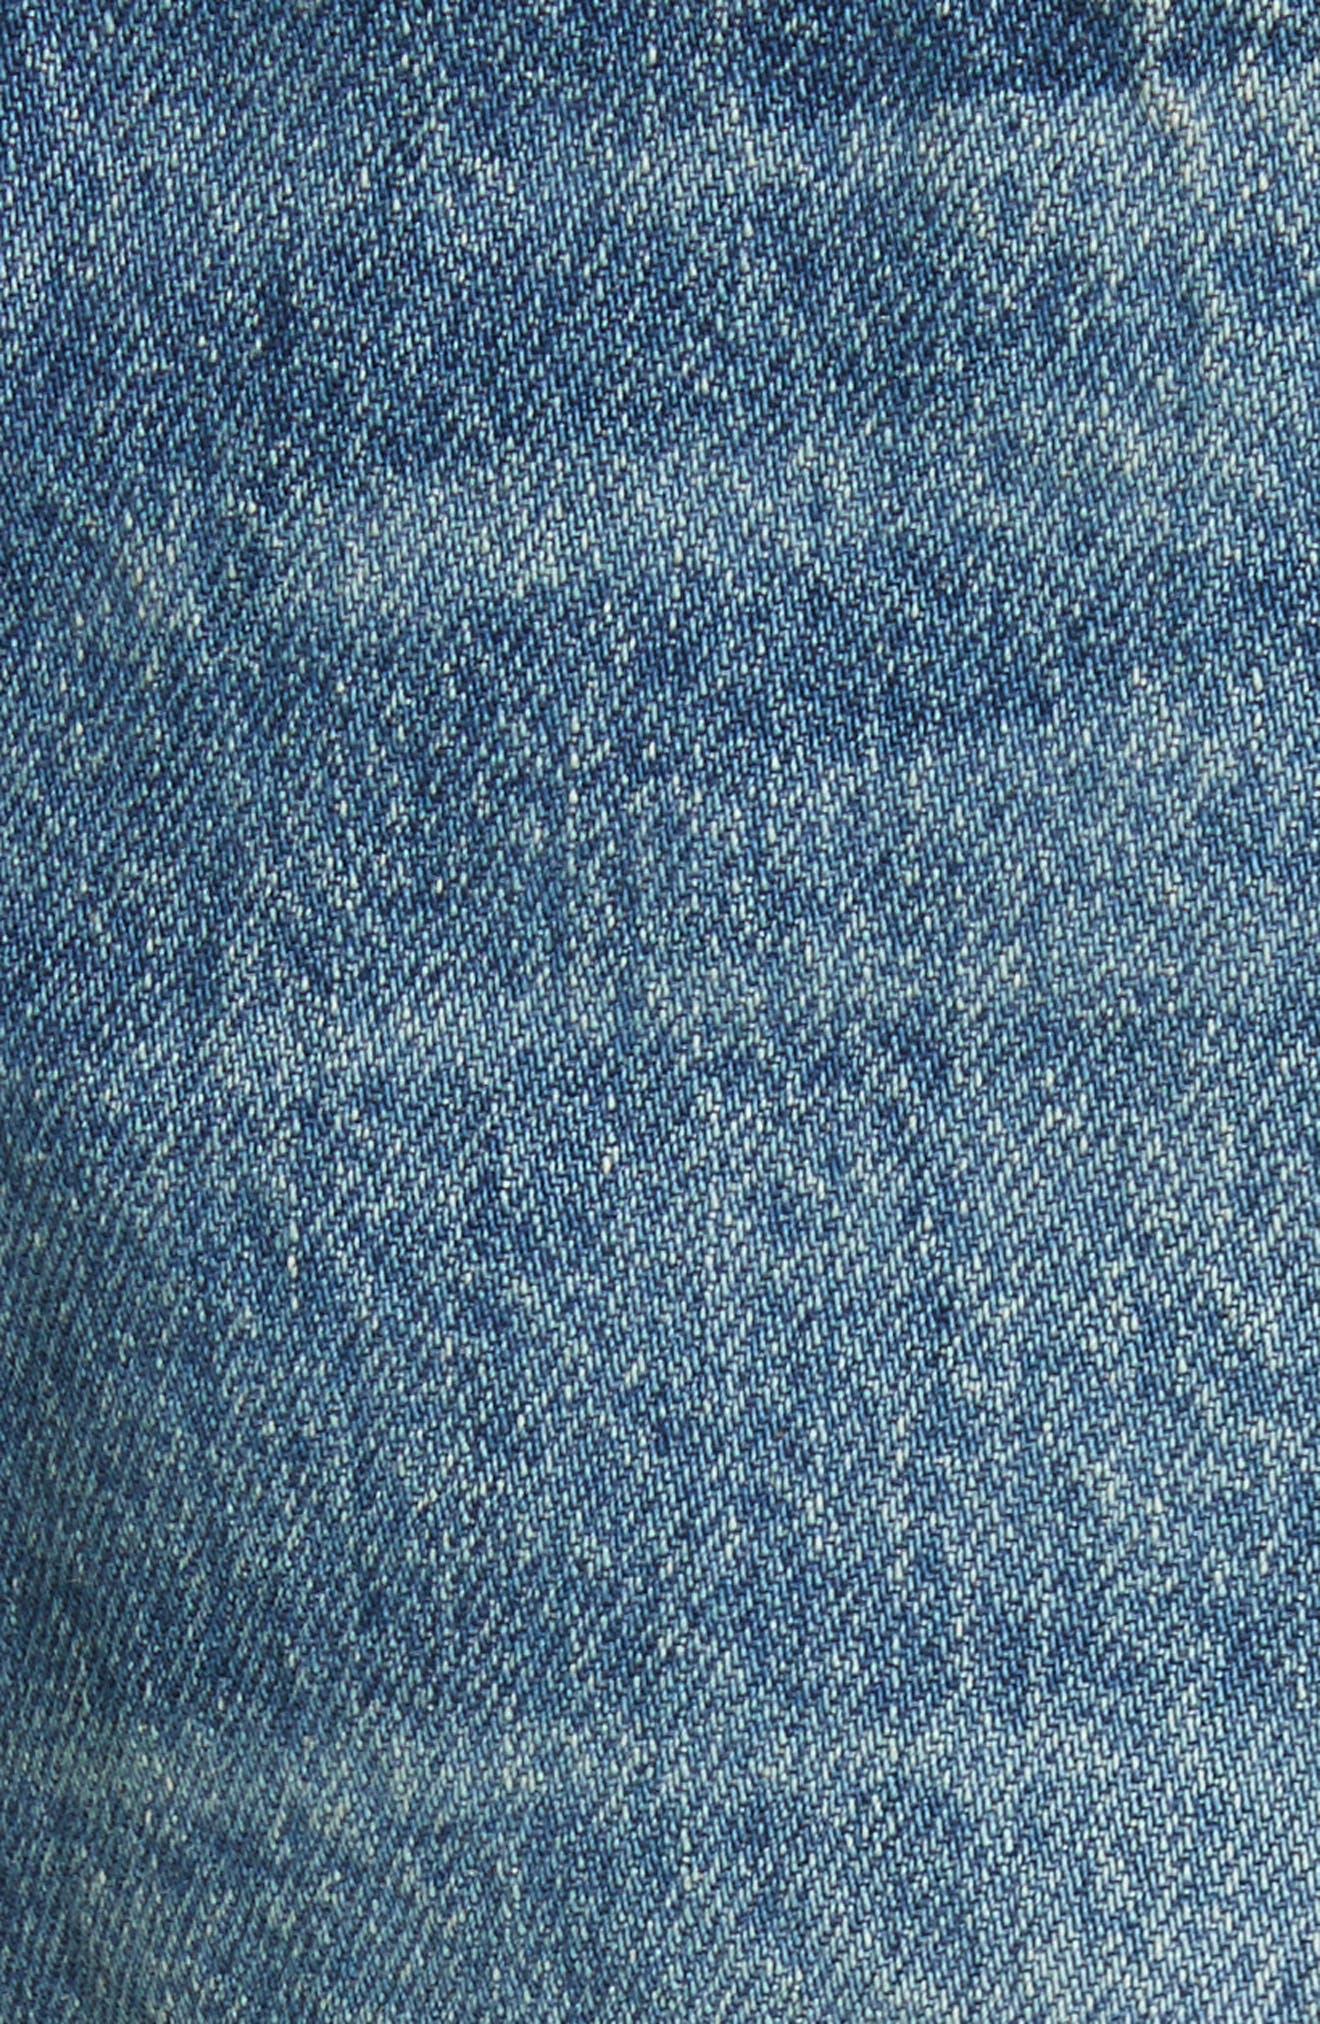 W4 Carter Ripped High Waist Denim Shorts,                             Alternate thumbnail 5, color,                             Elmar